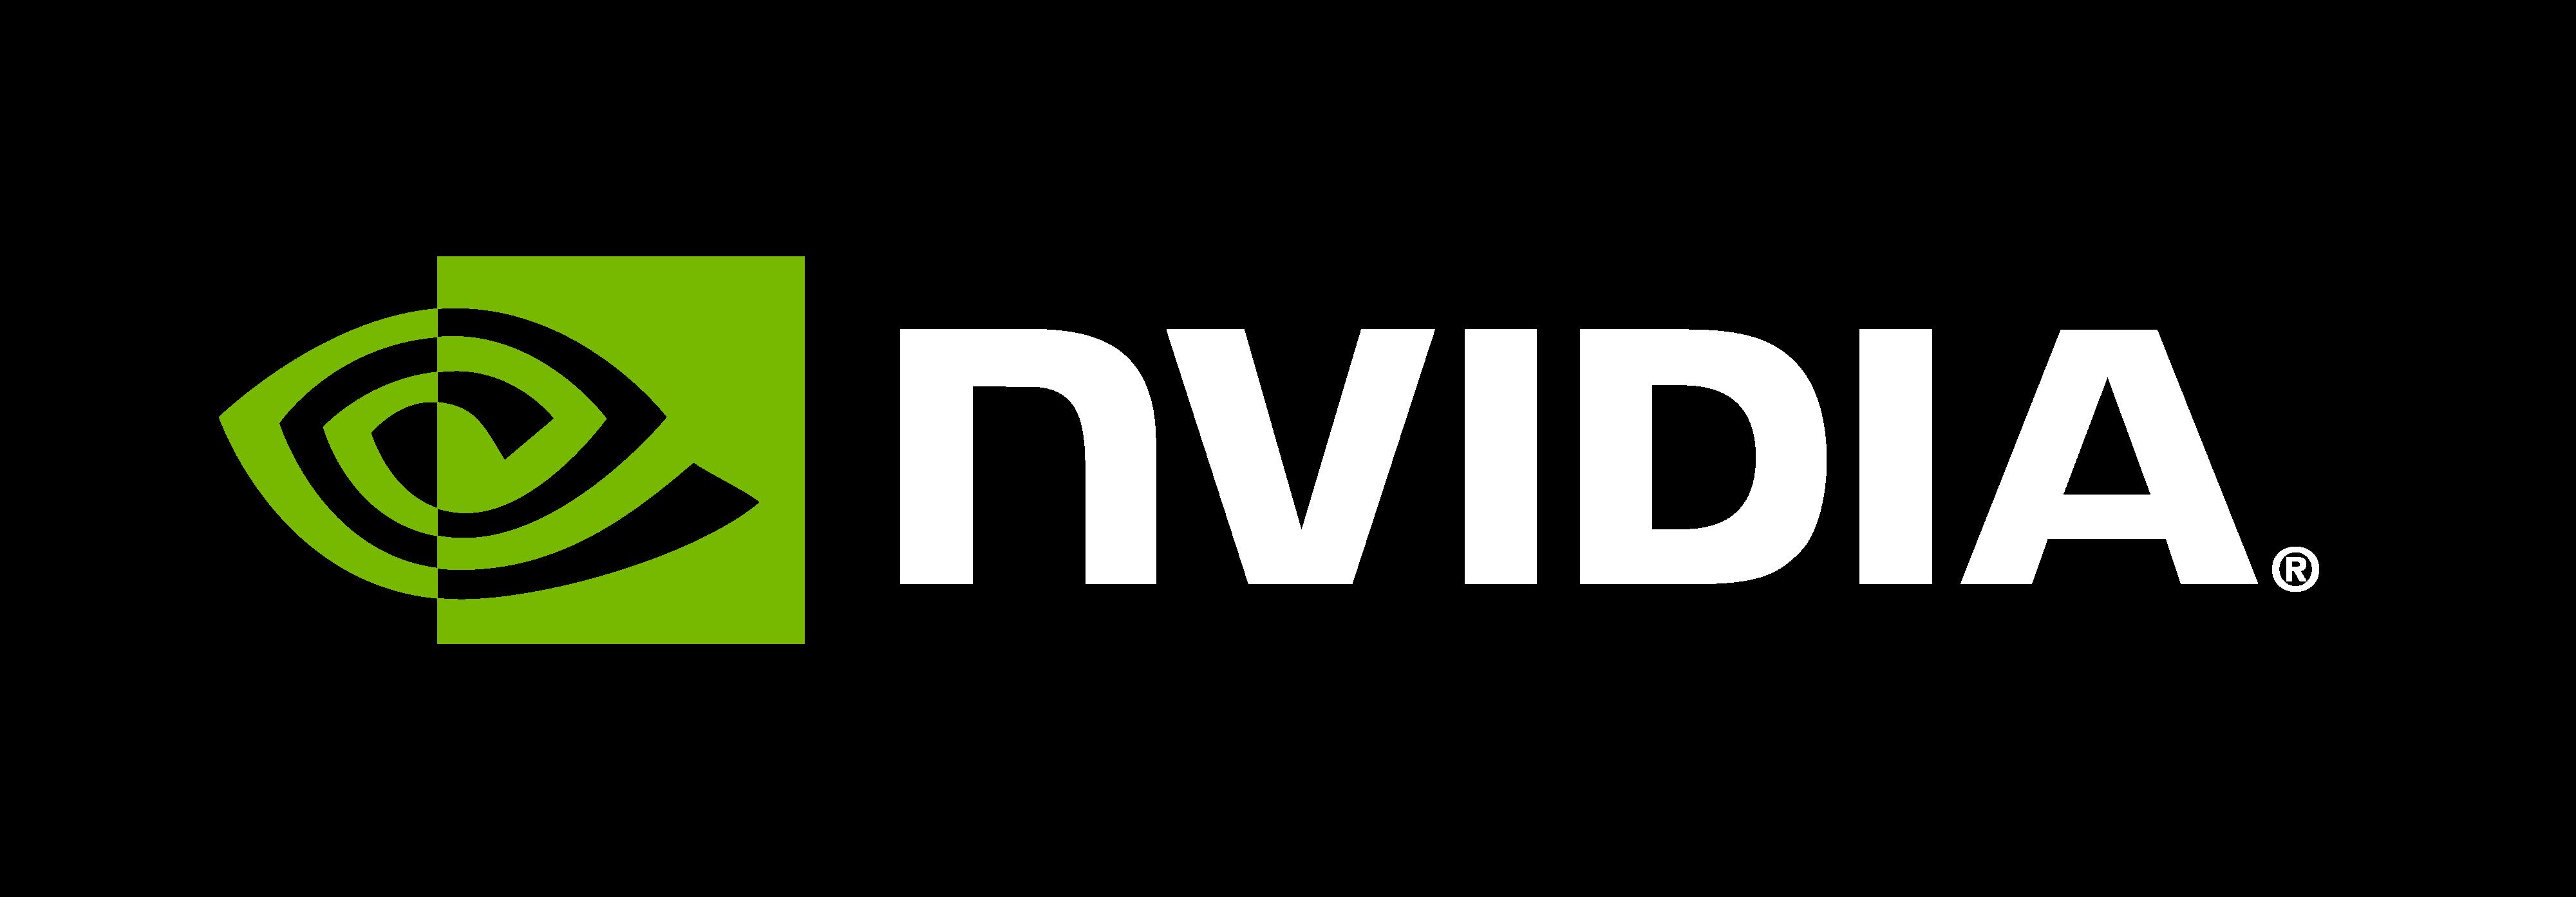 NVIDIA_Logo_H_ForScreen_ForDarkBG (1).png